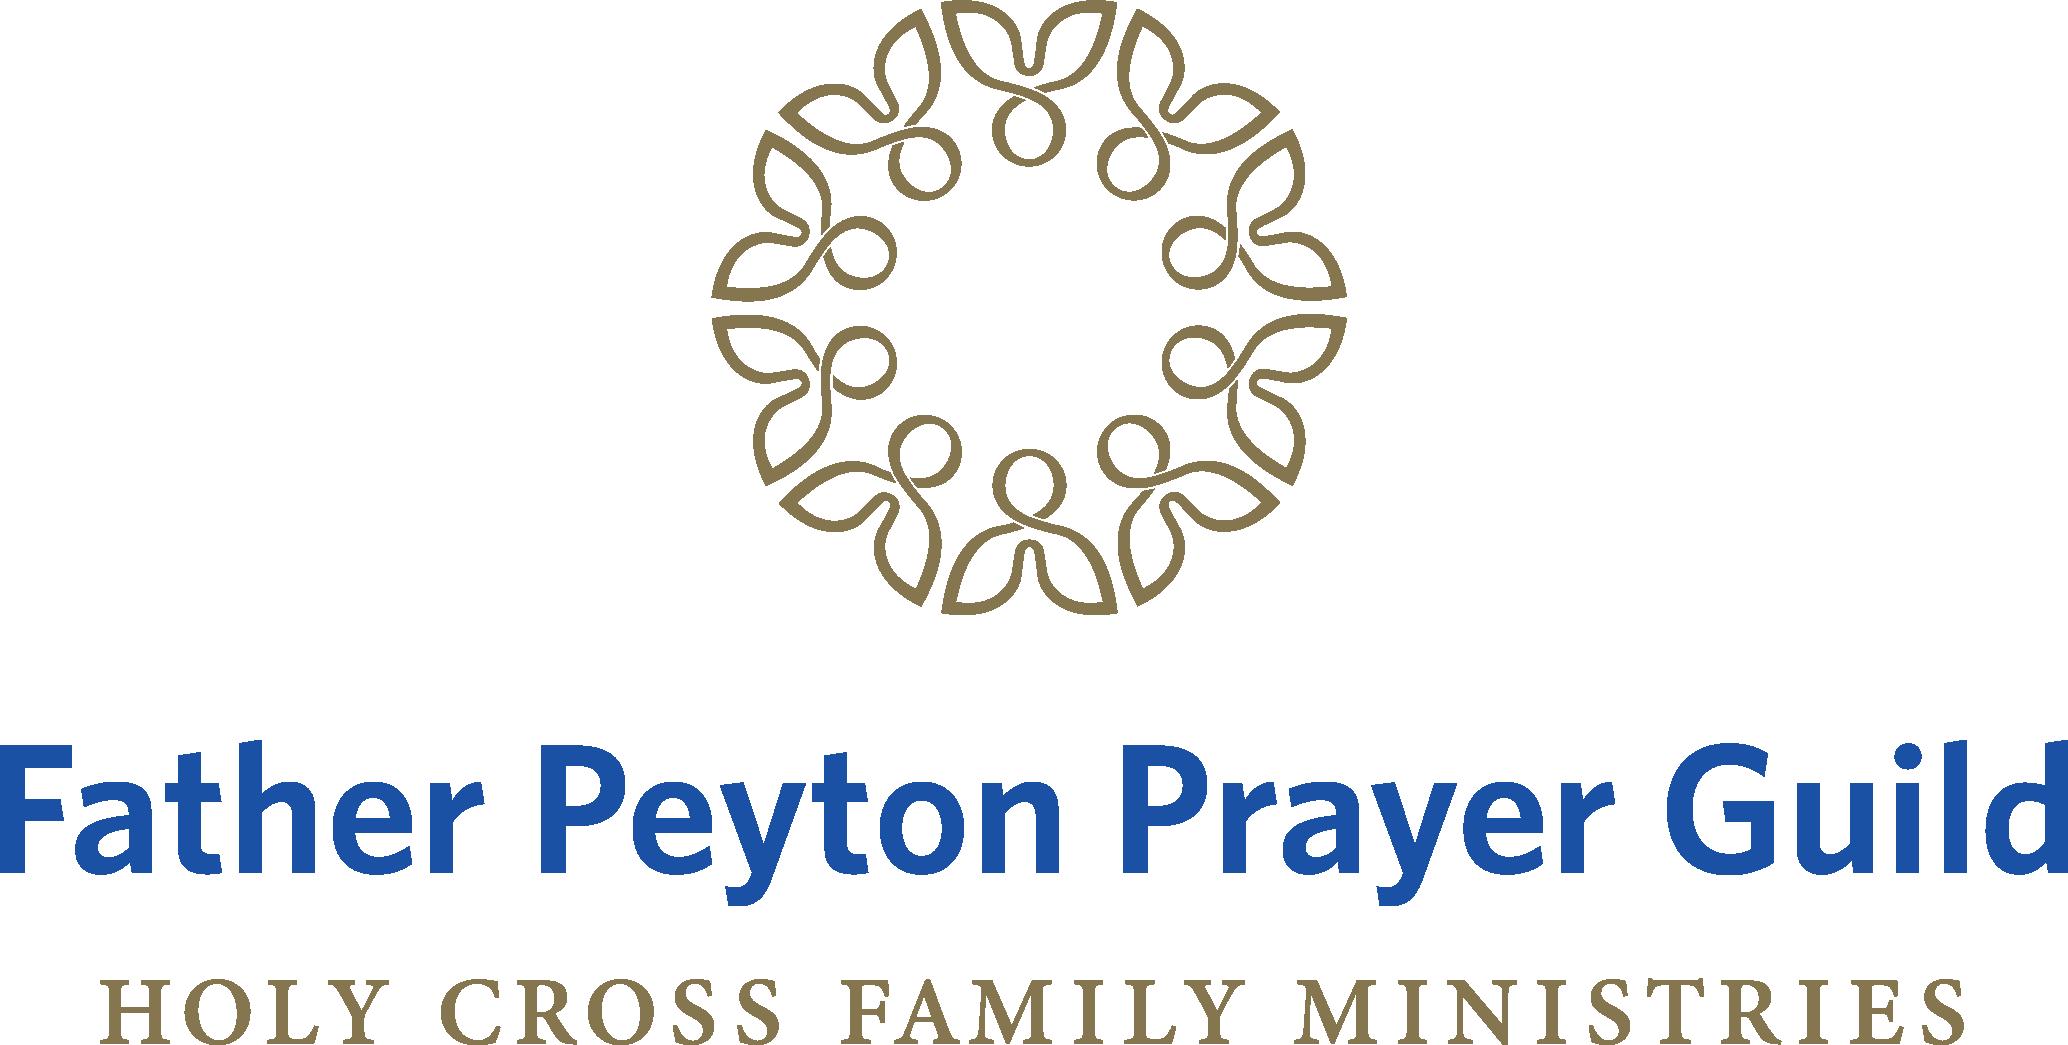 FP_PrayerGuild_logo2_pos_871c_2728c